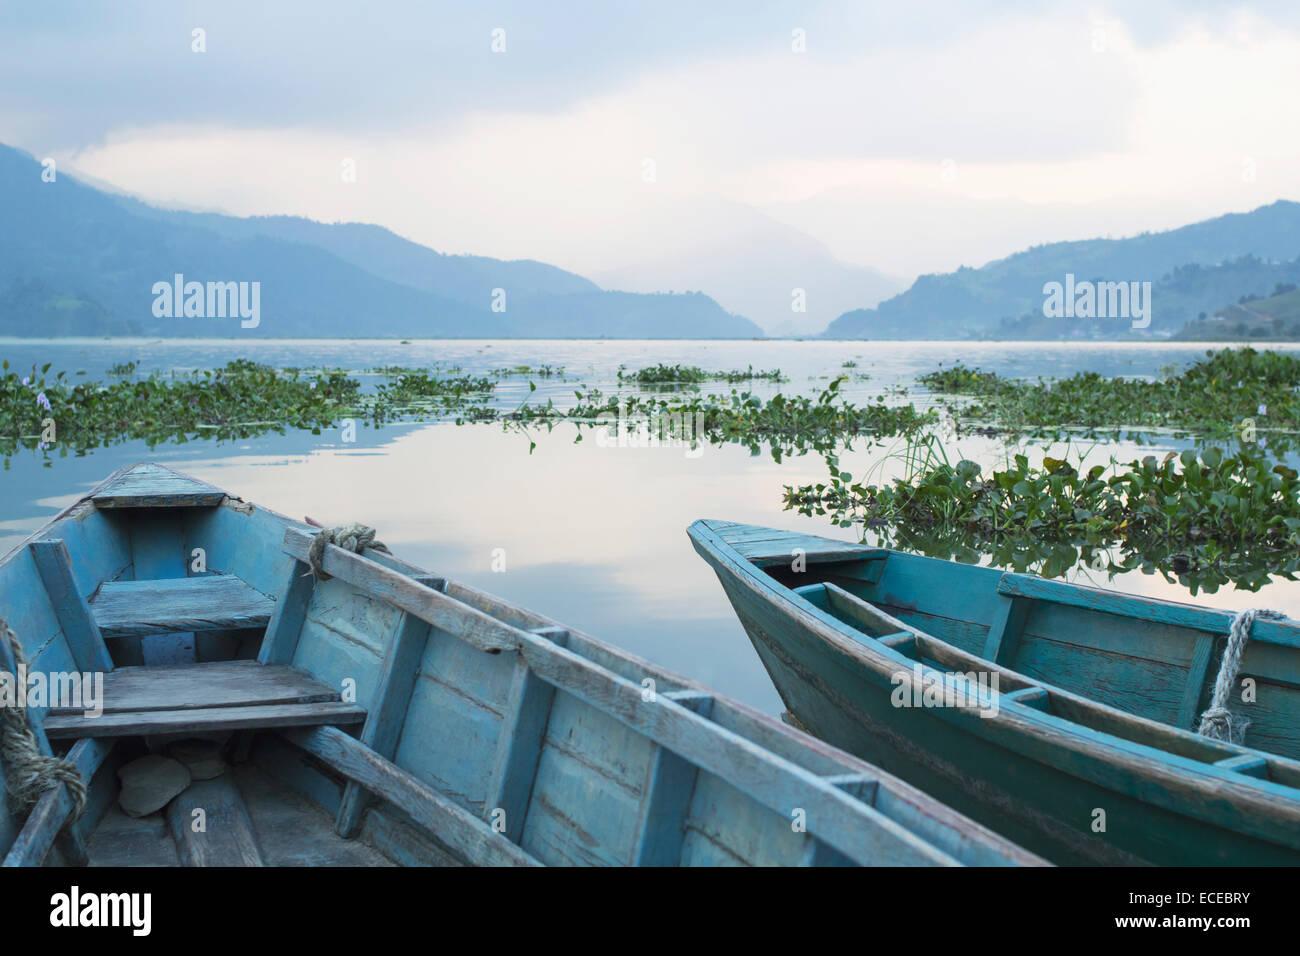 Nepal, Phewa, Cropped shot of two rowboats in mountain lake - Stock Image